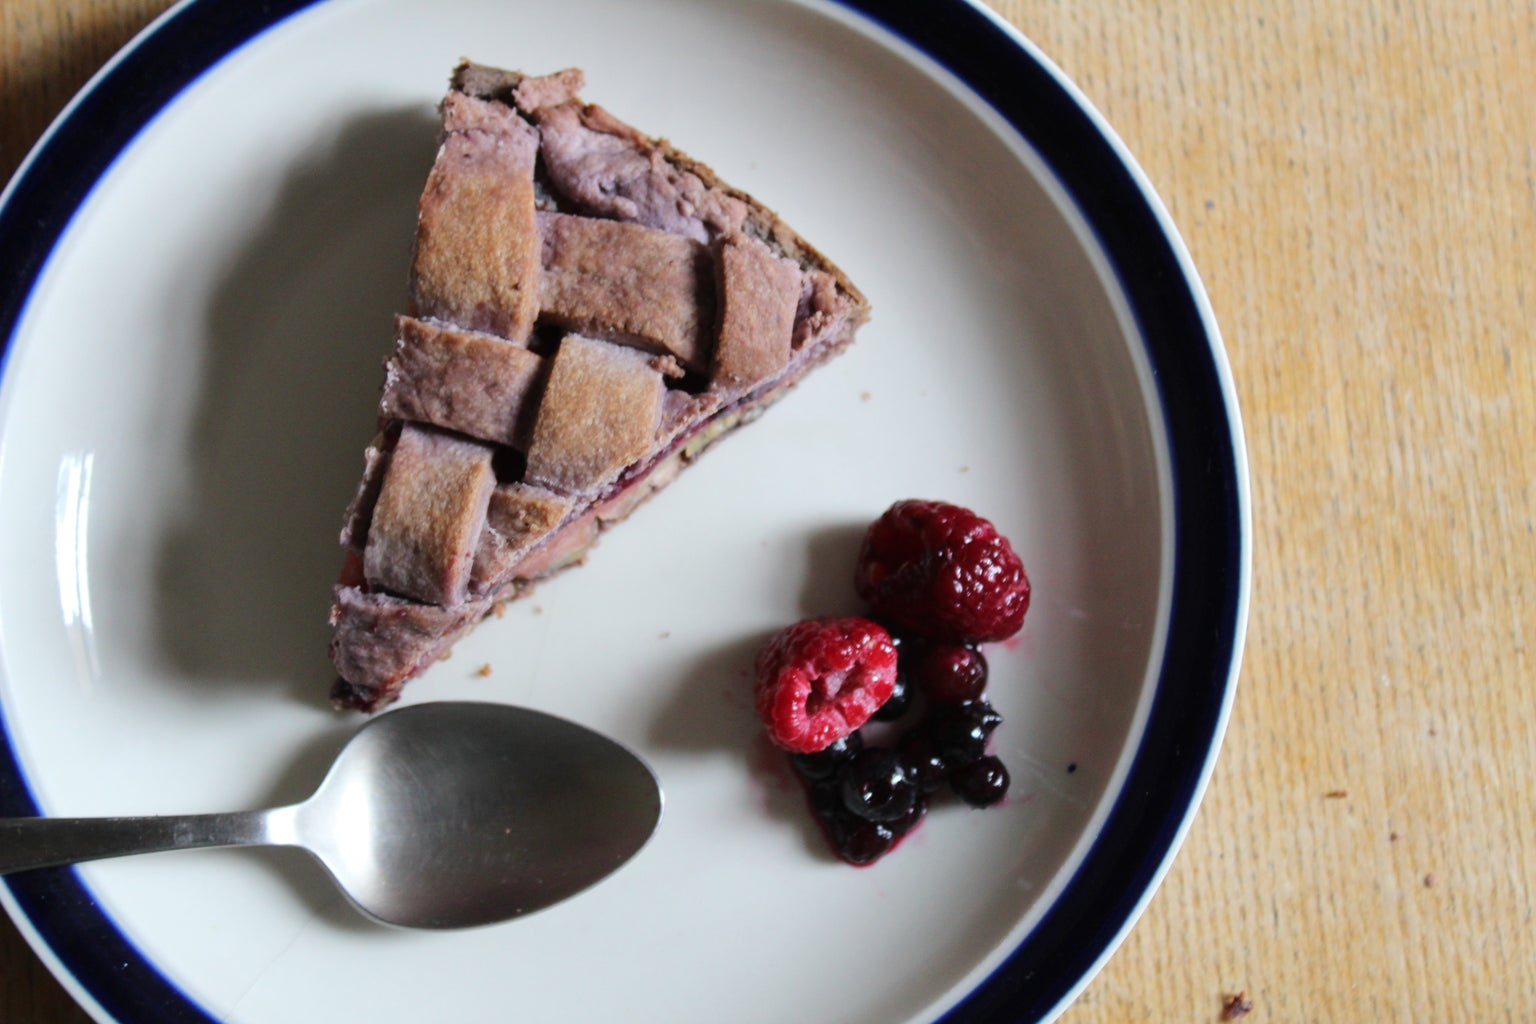 Colorant-free and Vegan Purple Pie